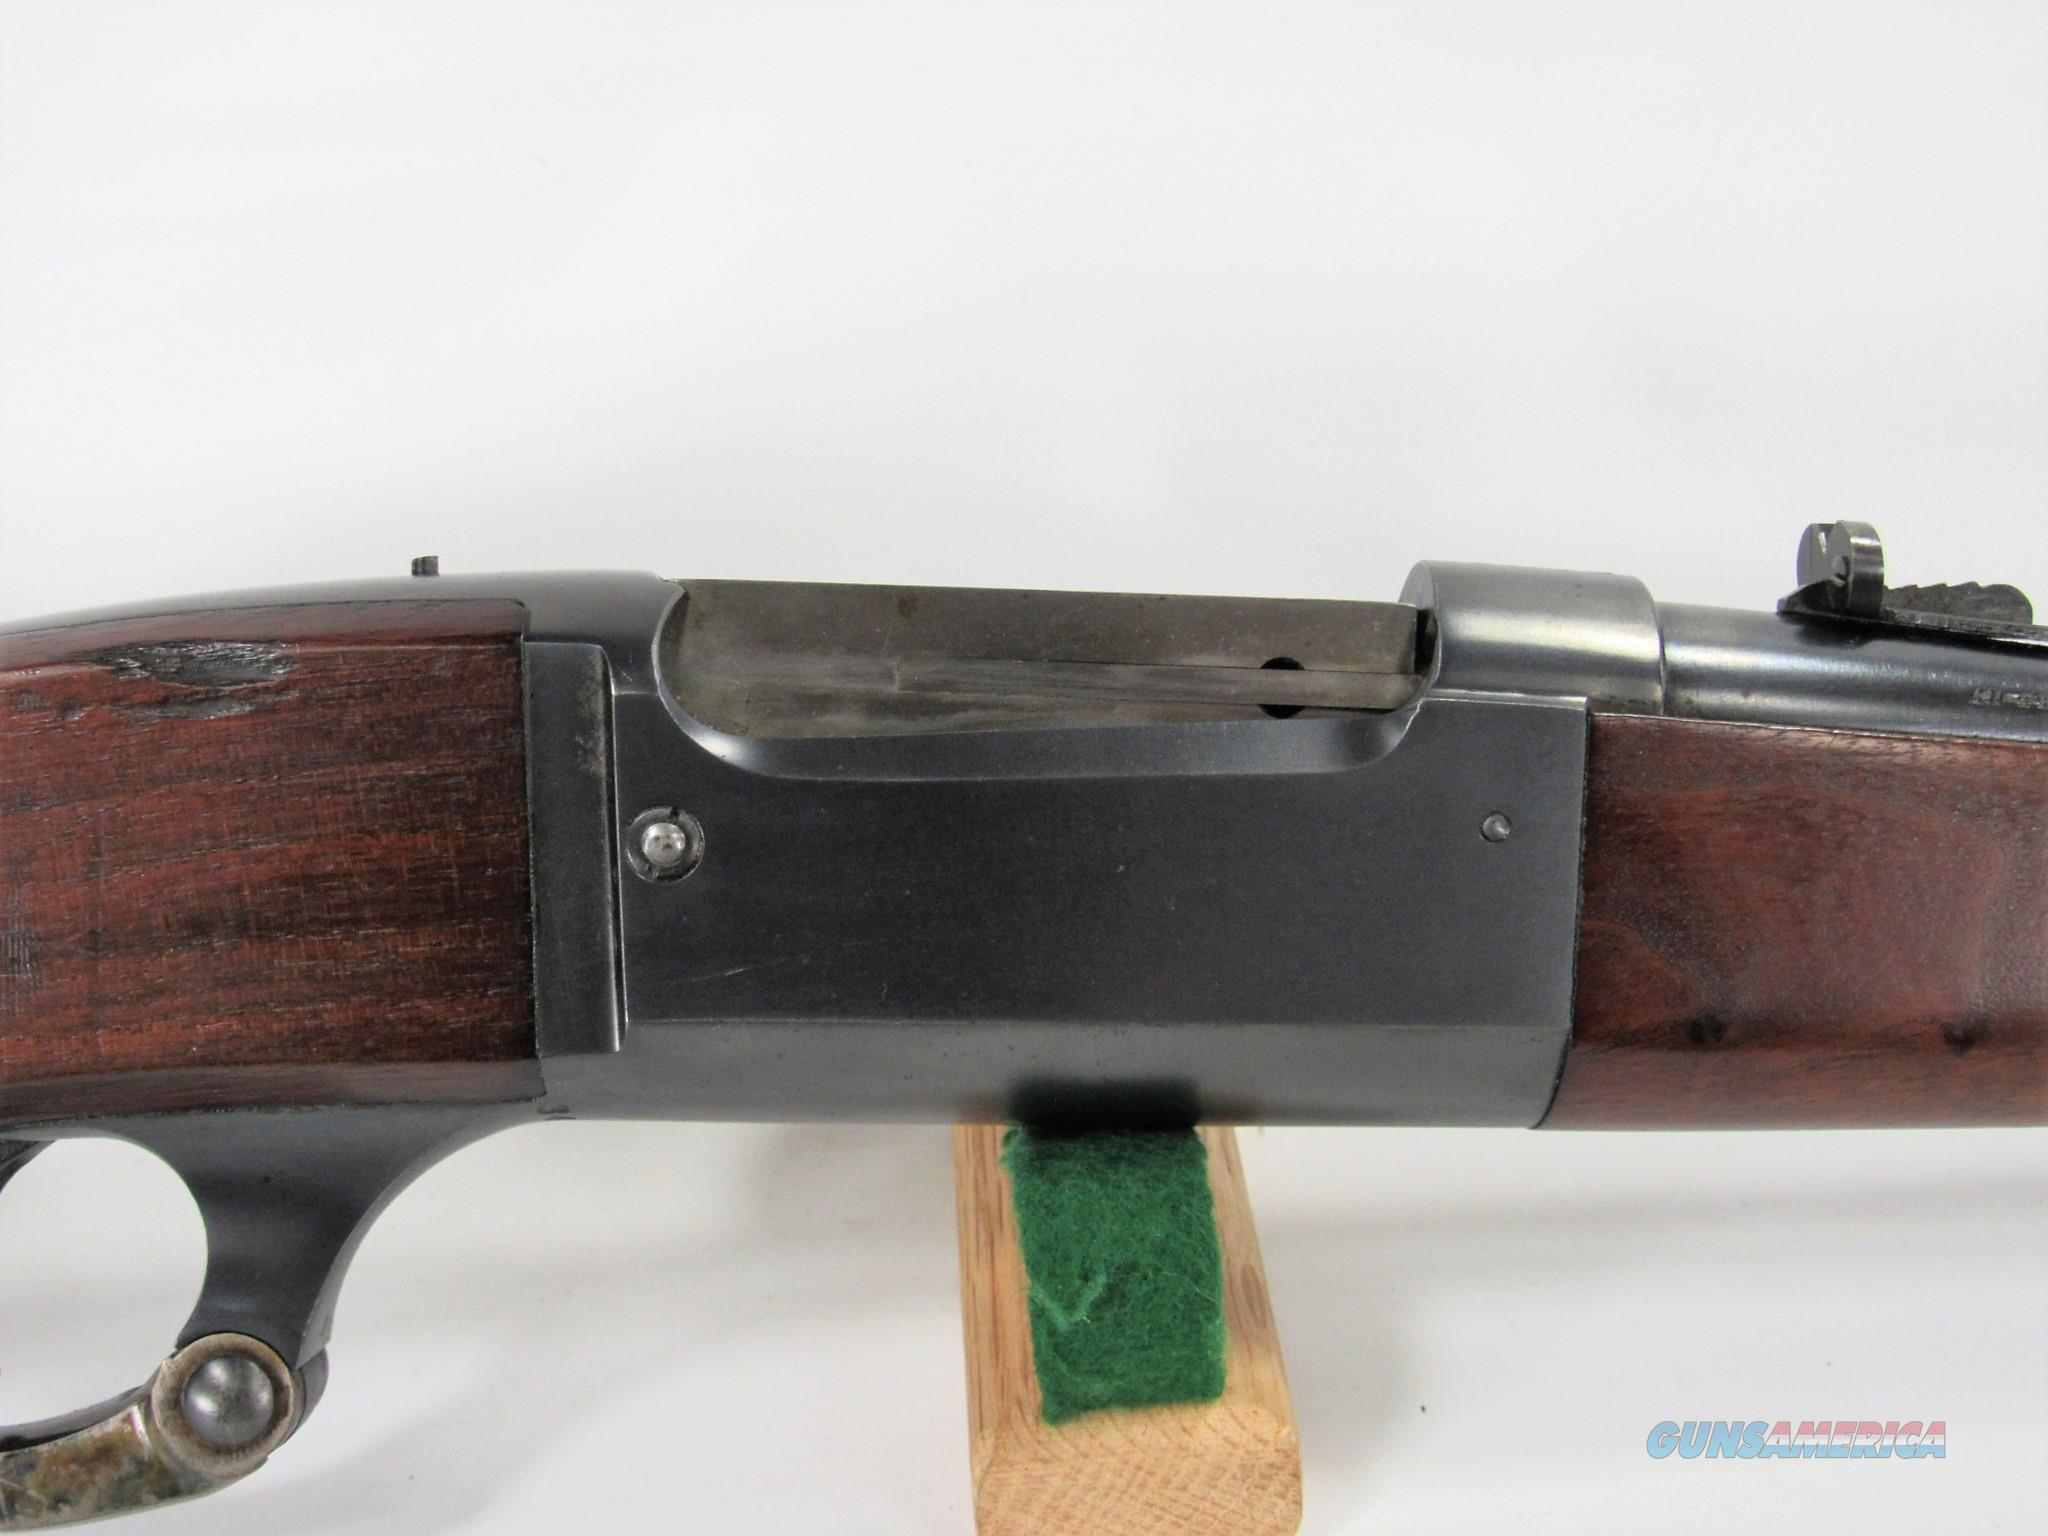 101Y SAVAGE 99 H BARREL BAND CARBINE 303  Guns > Rifles > Savage Rifles > Model 95/99 Family